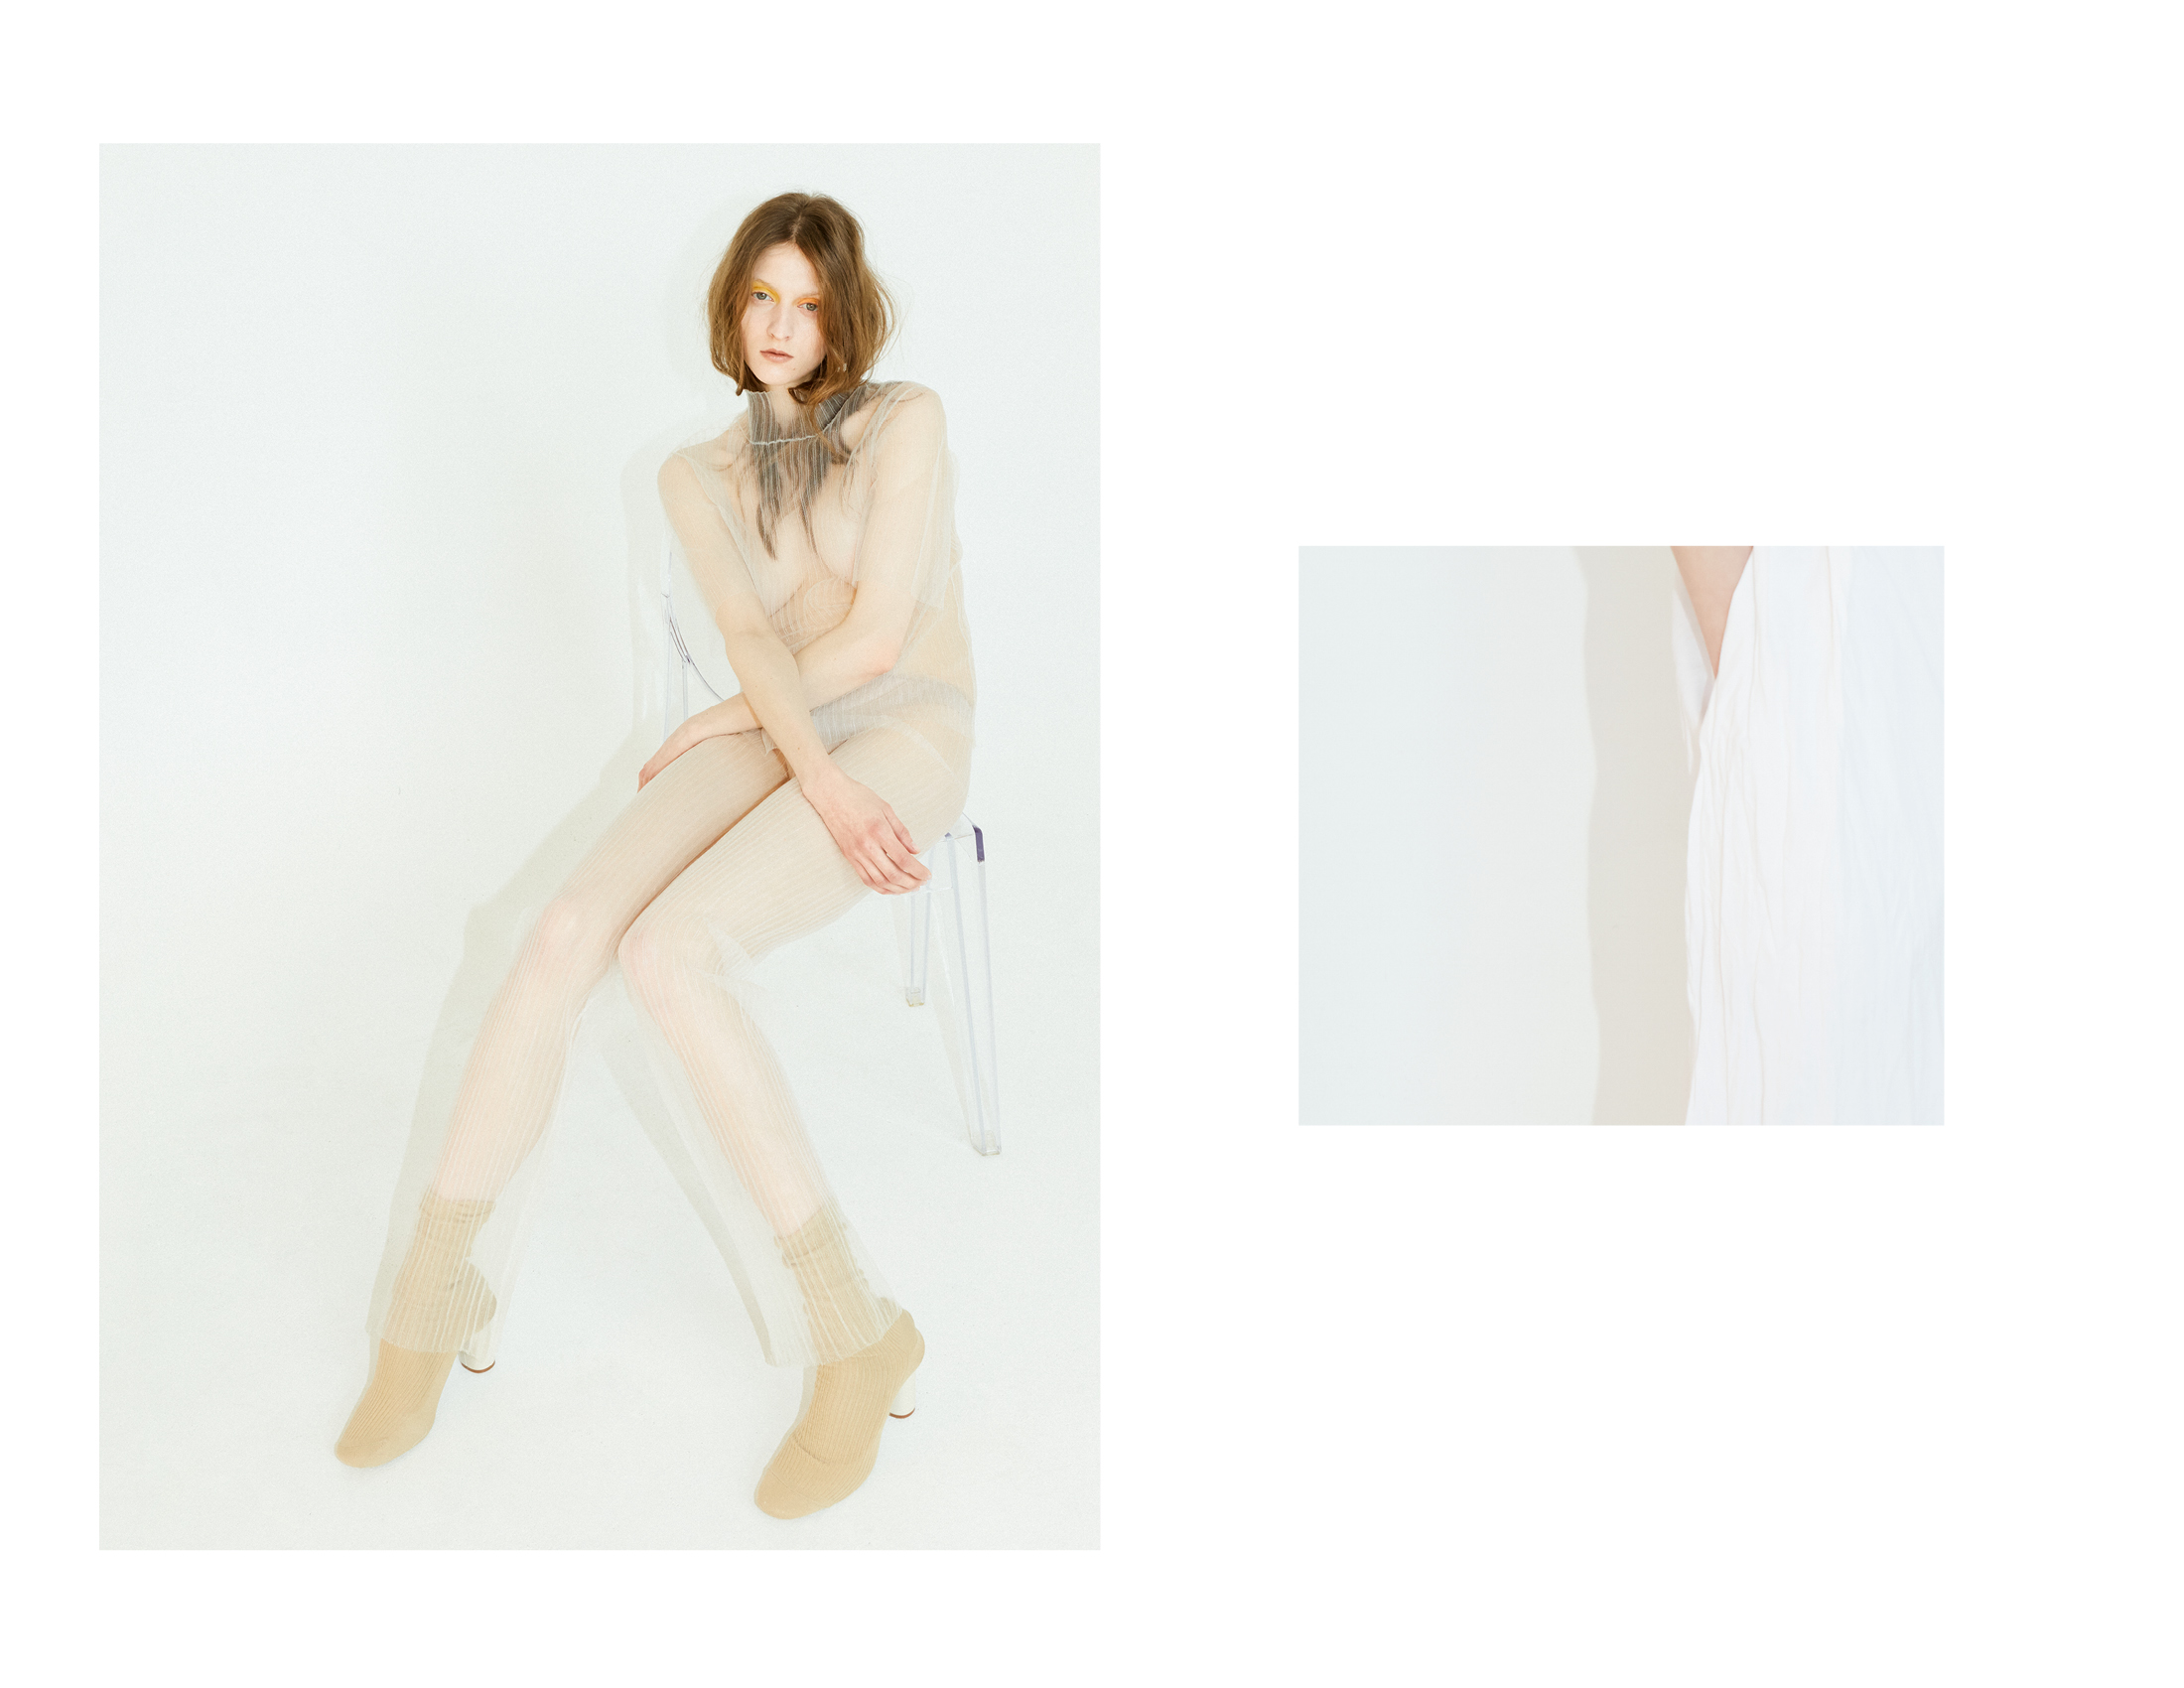 fc68c0c77fb4-Pan_Jin_lookbook9.jpg